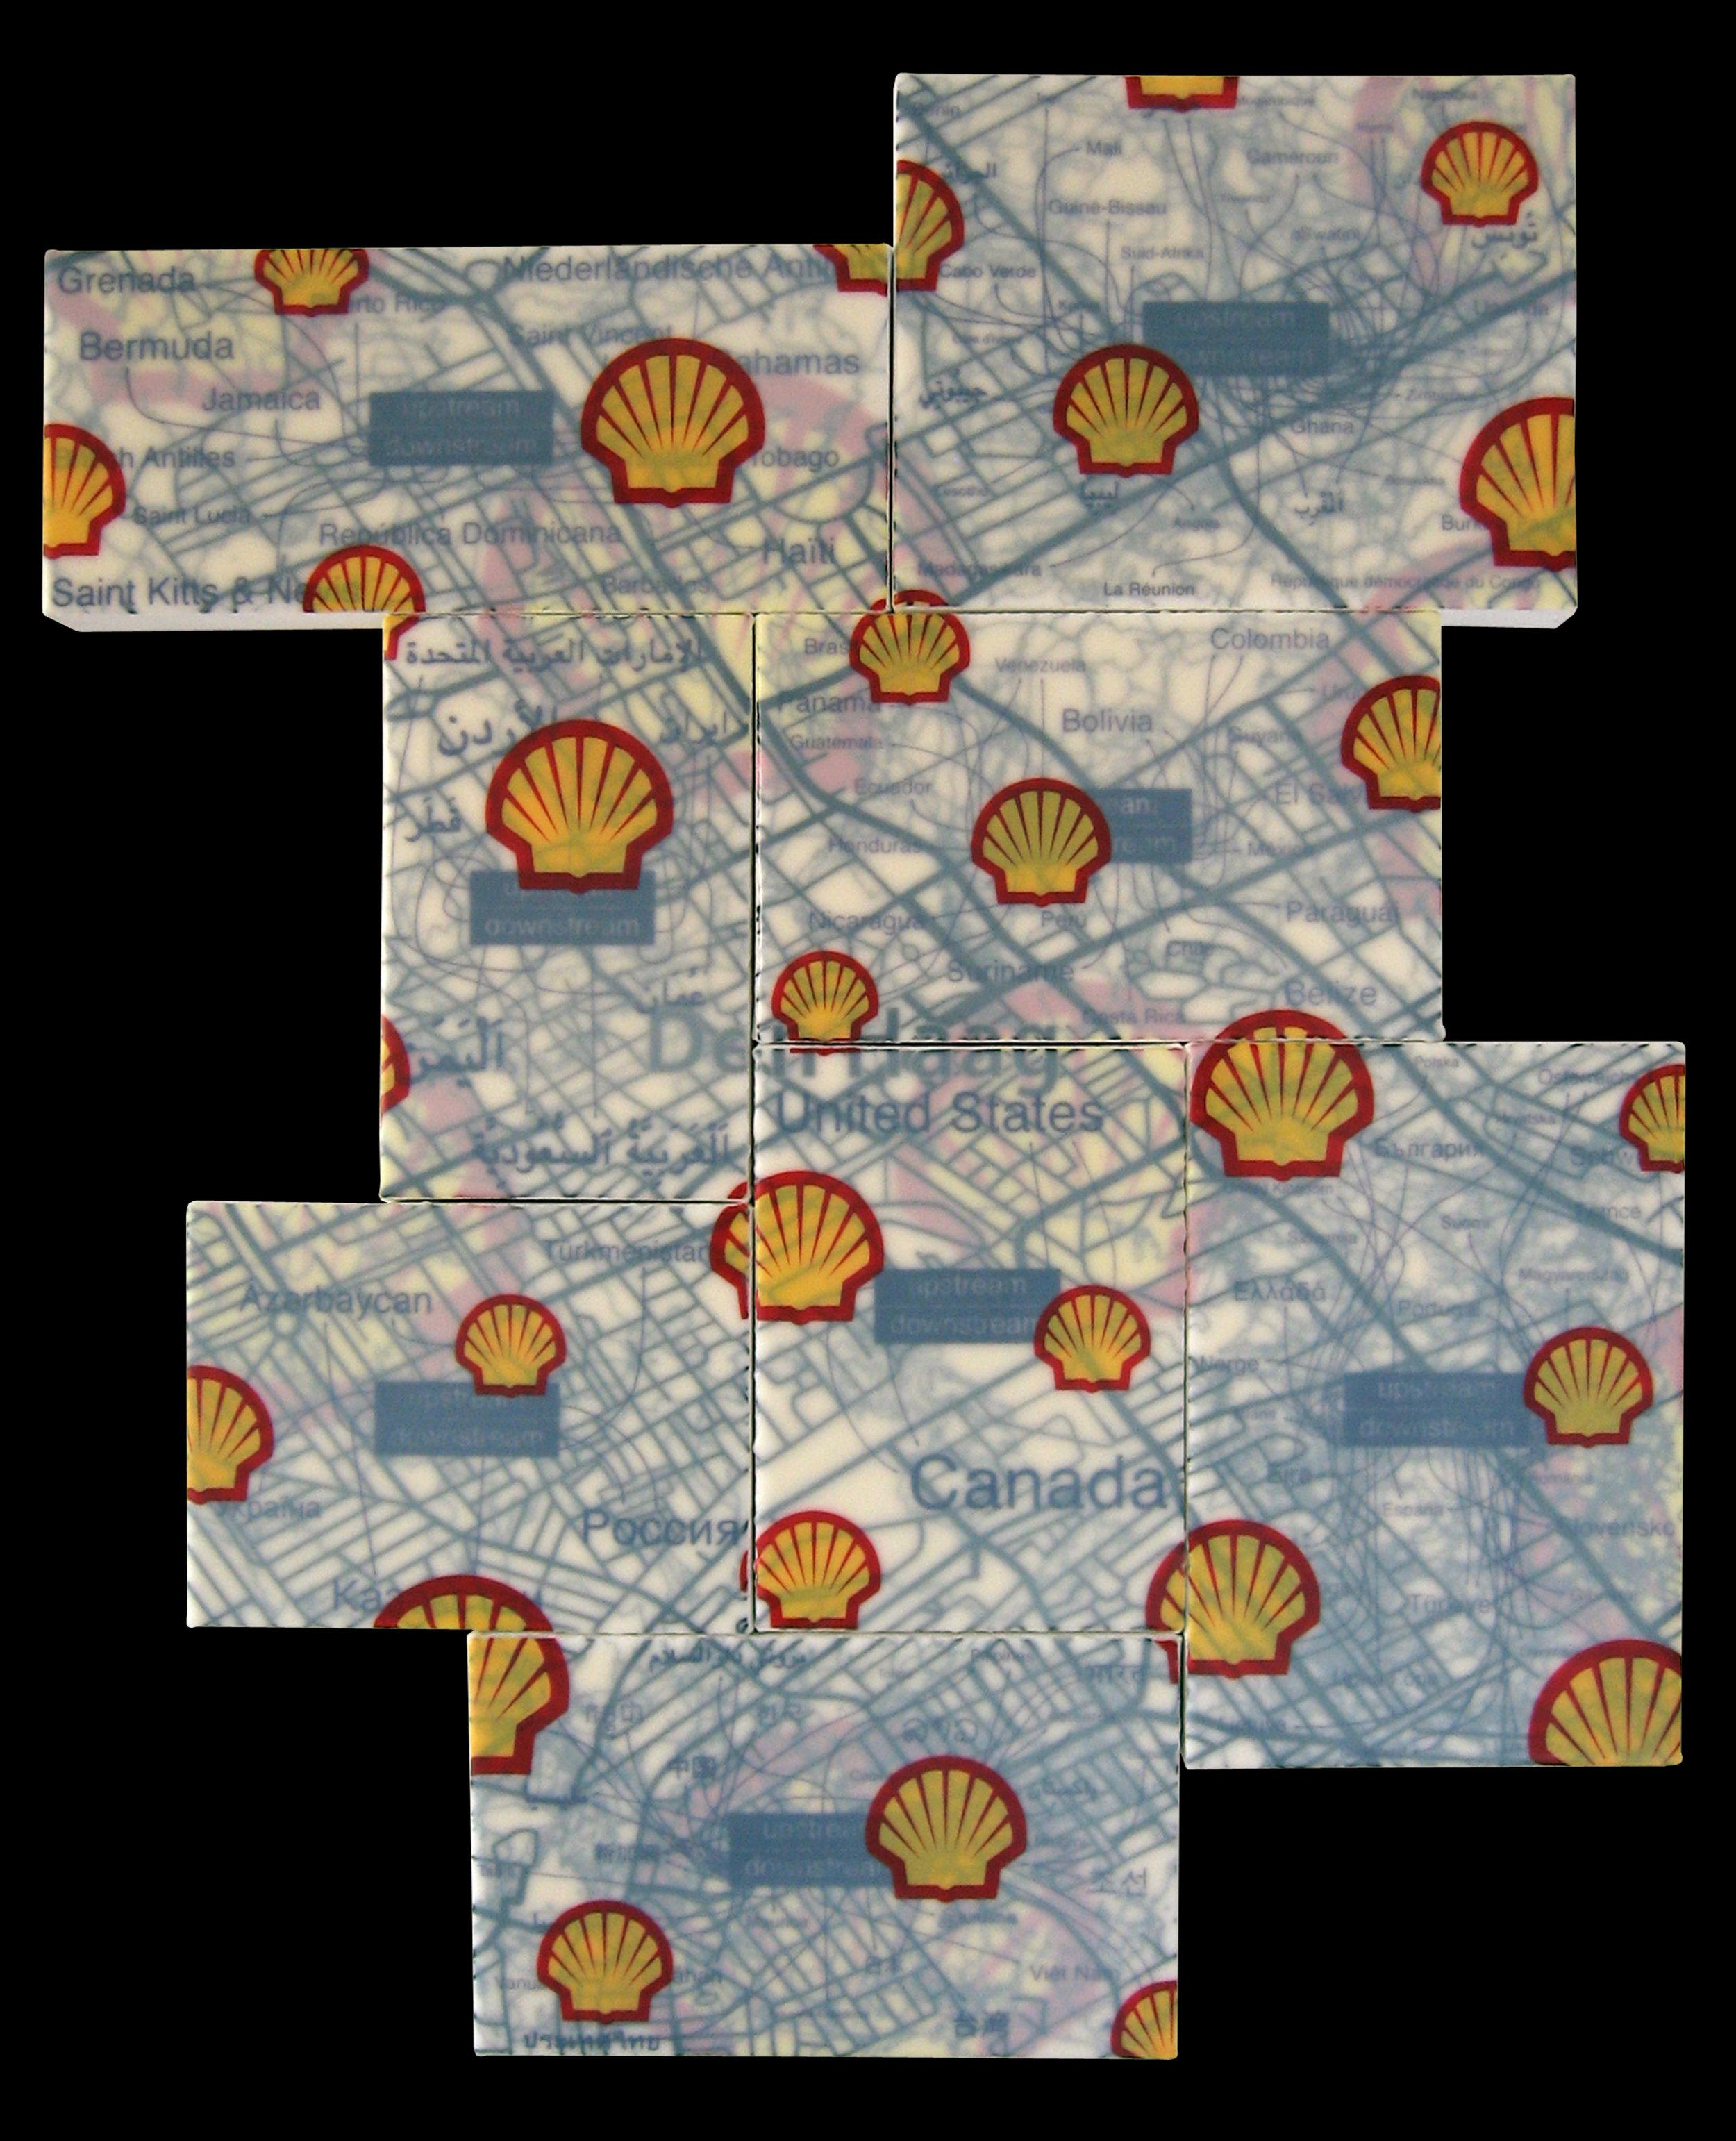 """Royal Dutch/Shell Group"" acrylic, screen print and glue on canvas 36""x24"" 2007"